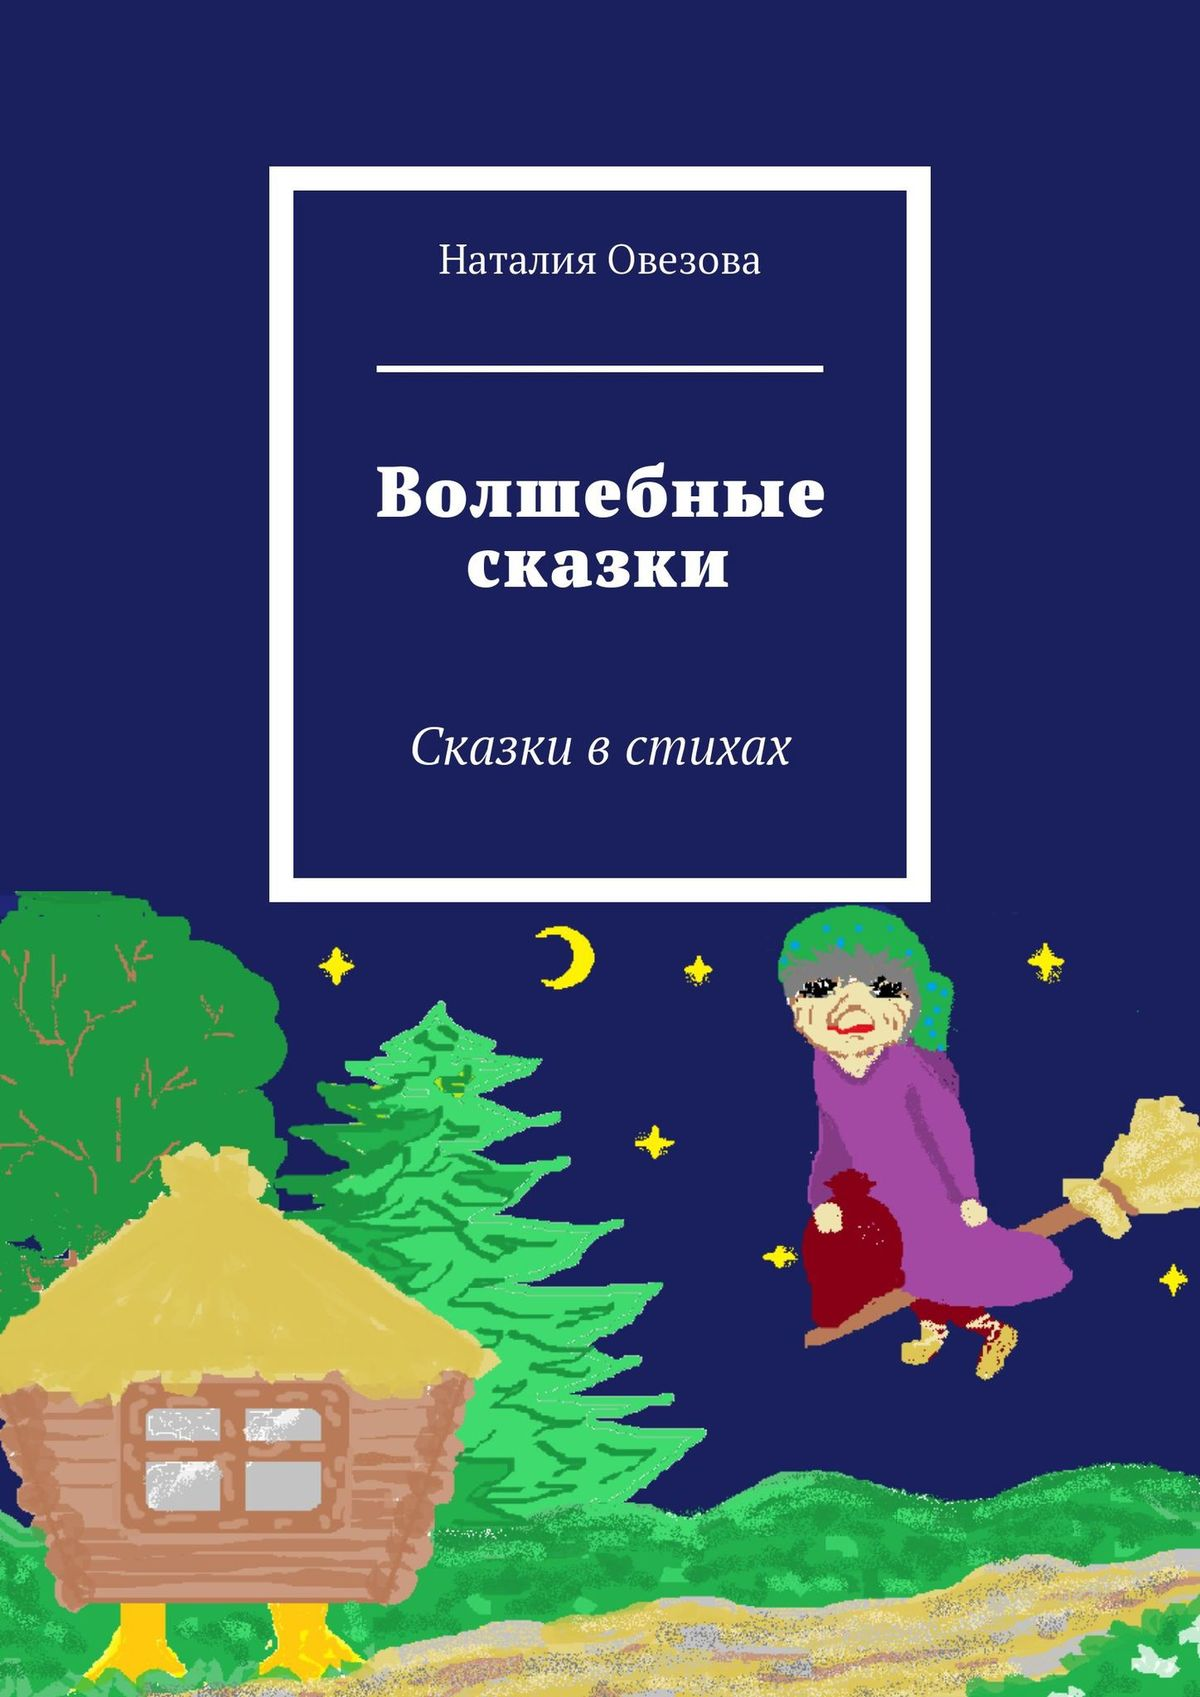 Наталия Овезова Волшебные сказки. Сказки встихах цена